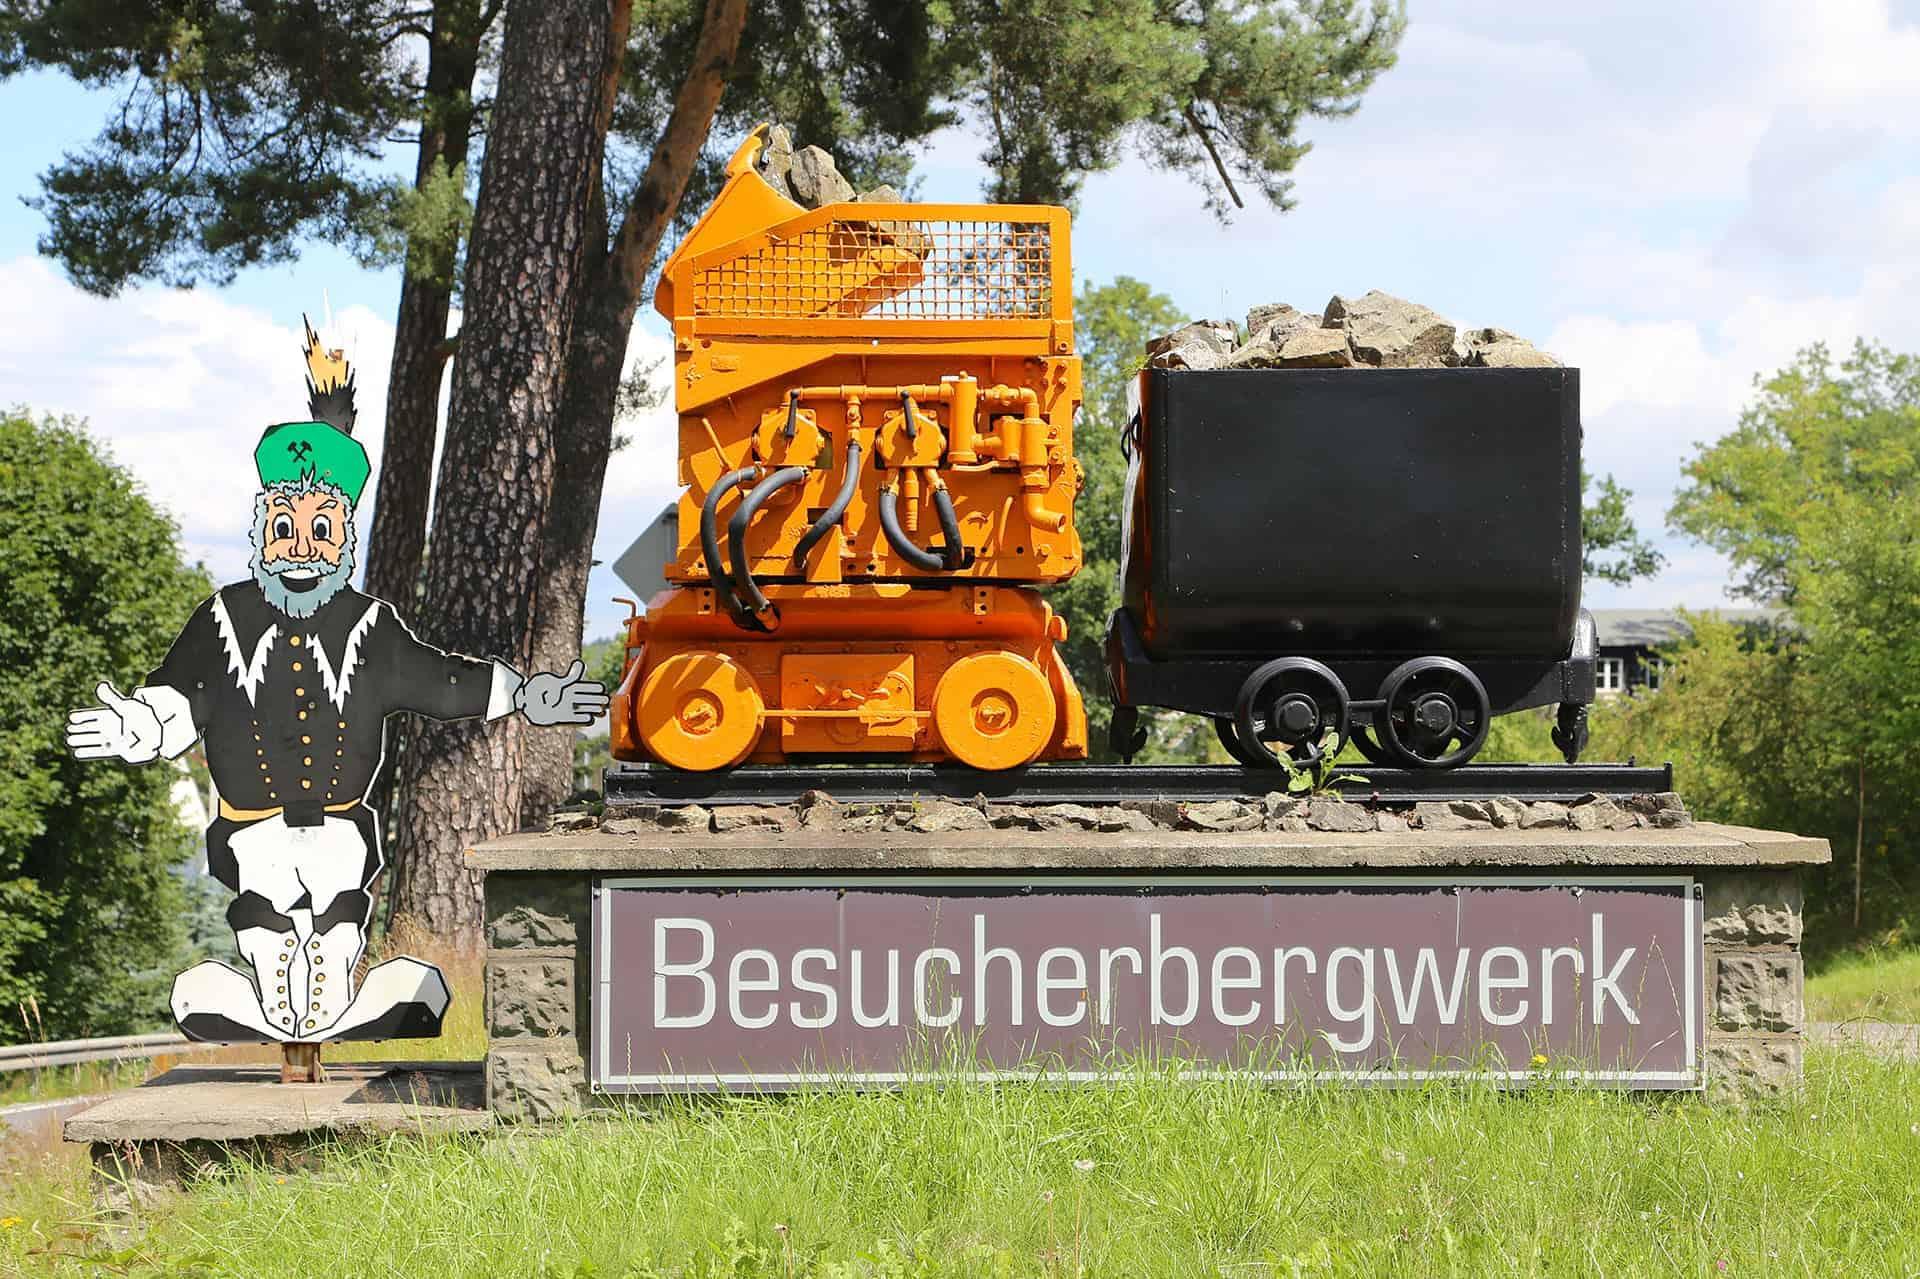 Besucherbergwerk Sauberg in Ehrenfriedersdorf